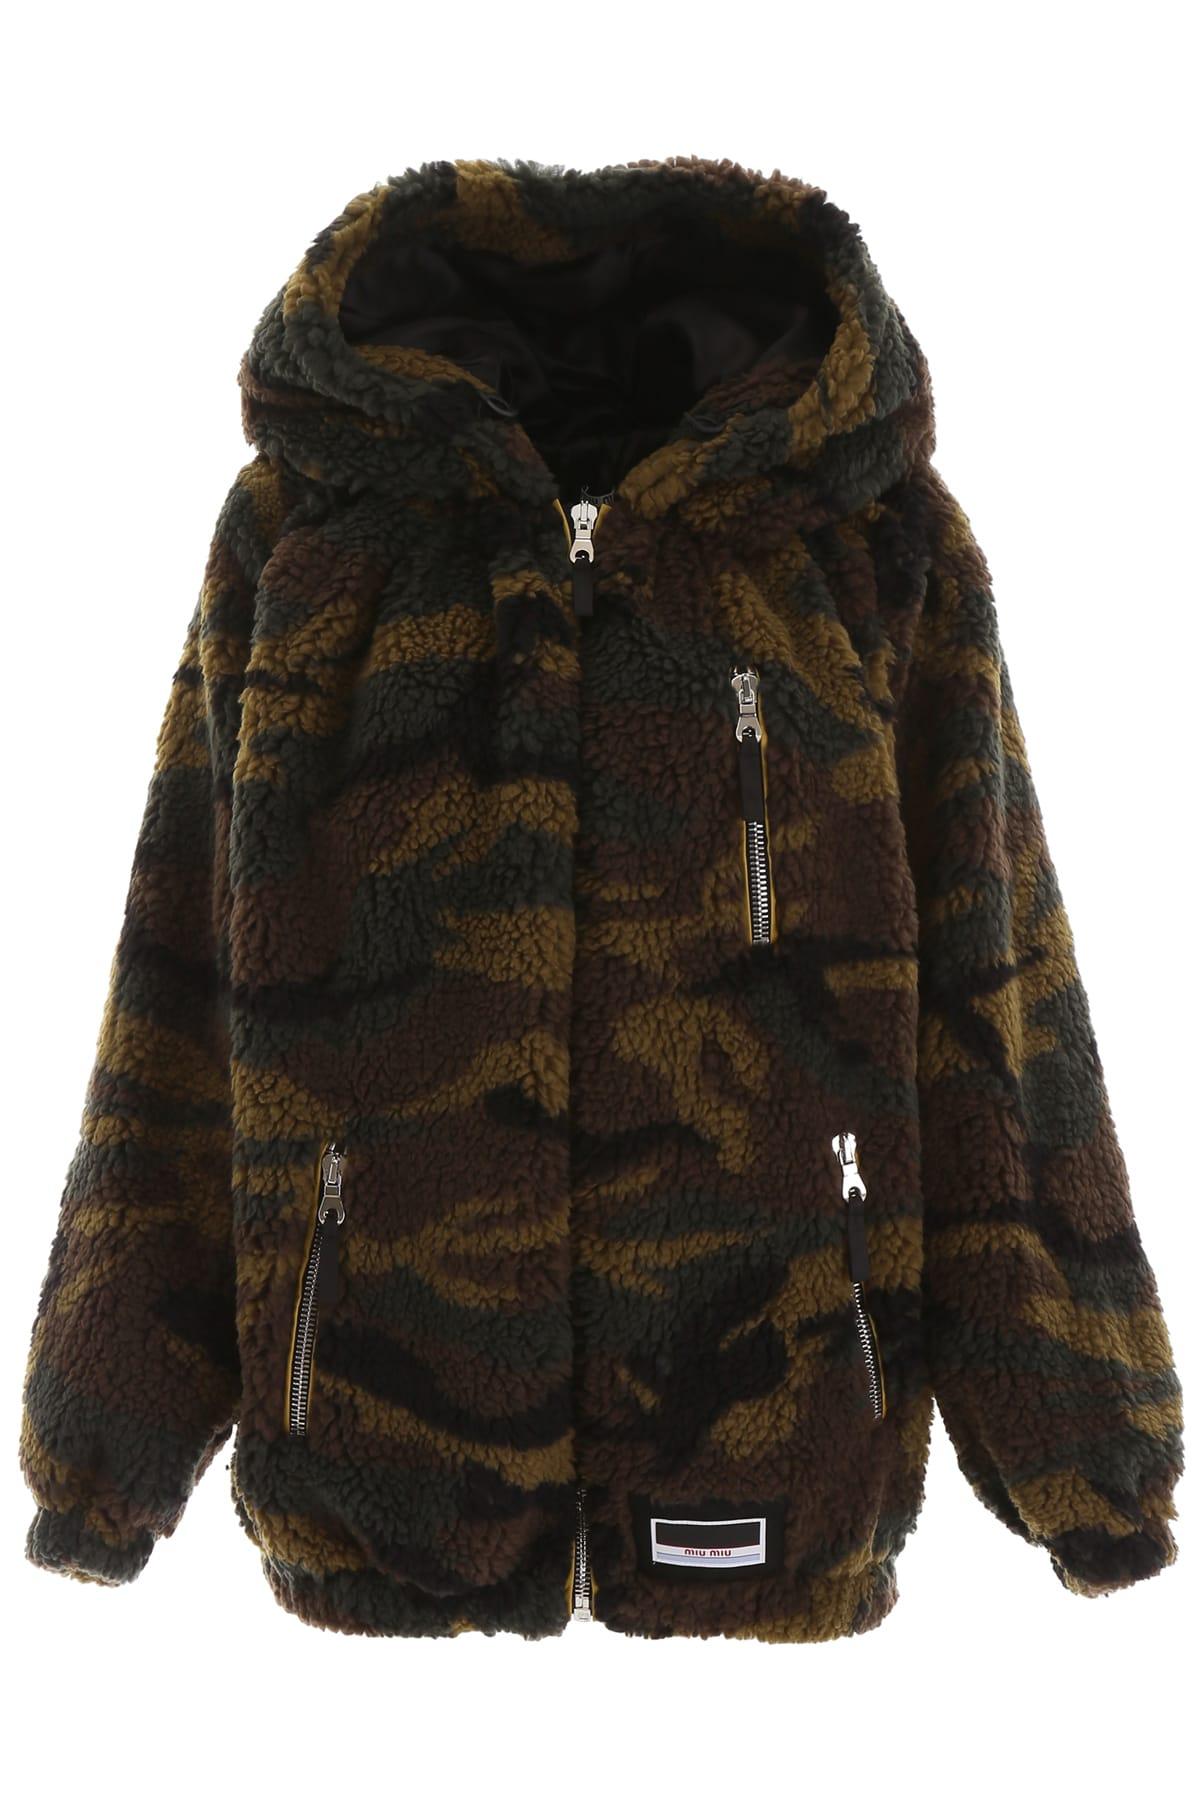 Miu Miu Camouflage Faux Shearling Jacket